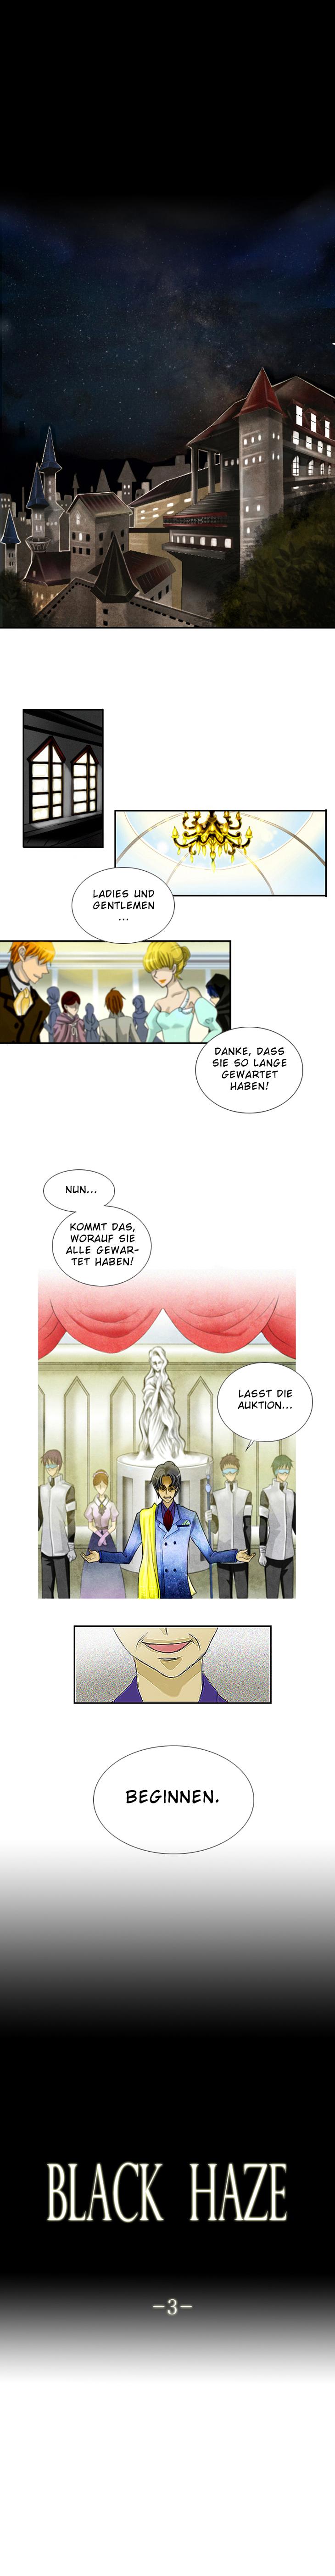 https://wie.mangadogs.com/comics/pic/35/35/190217/Kapitel385_0.jpg Page 1